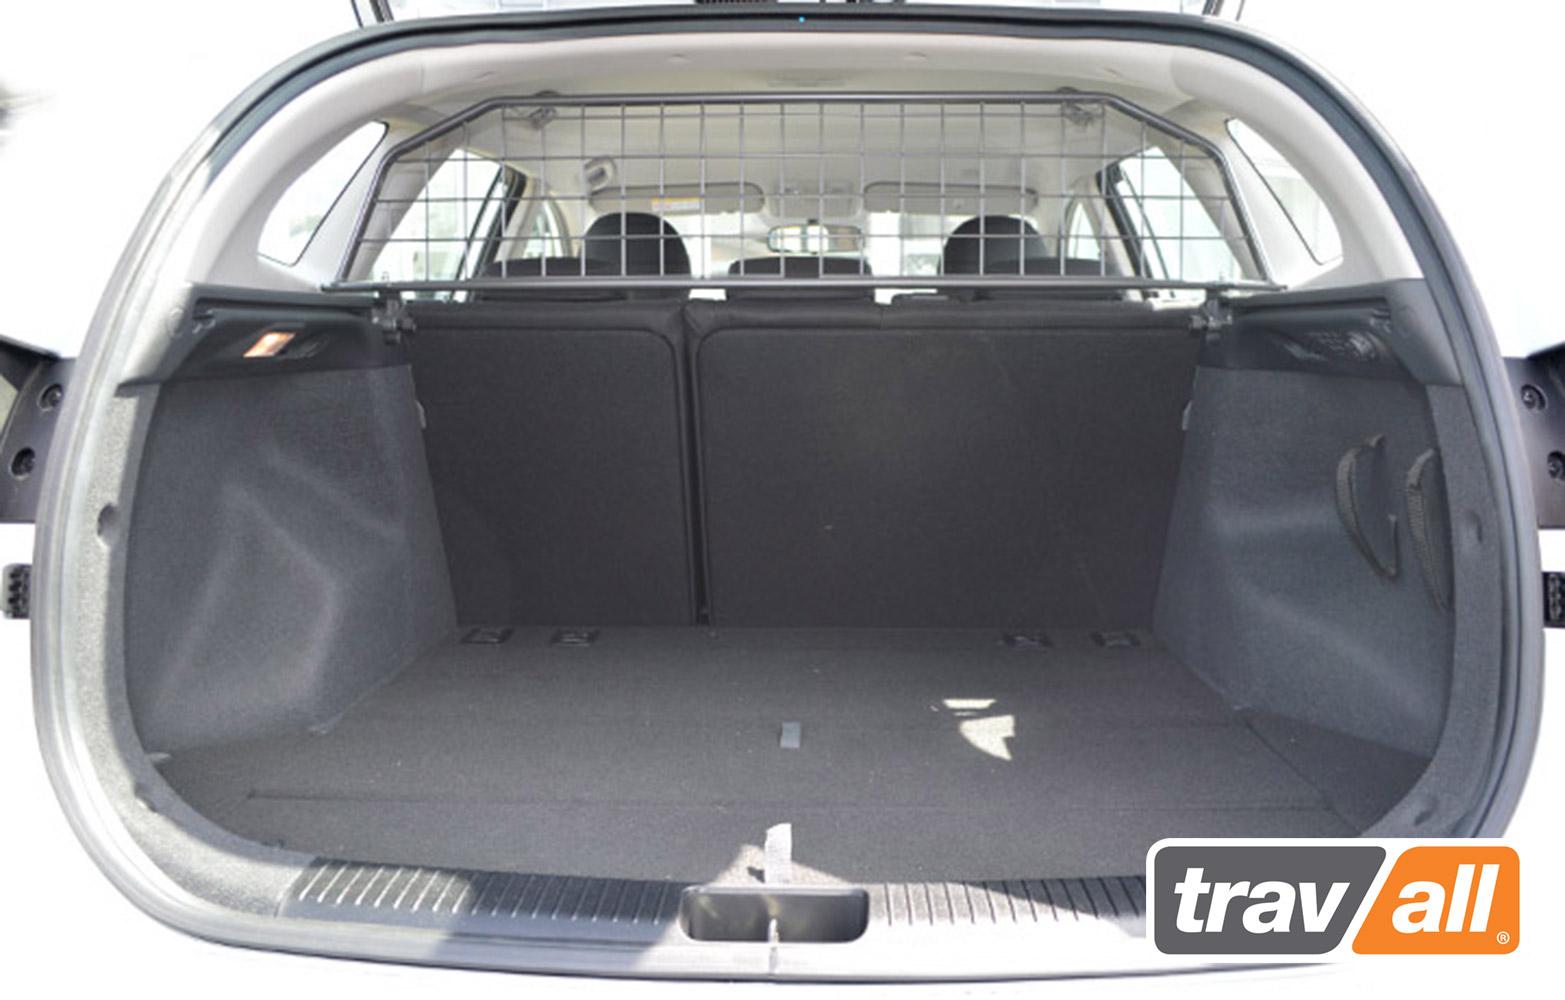 Koiraverkko Hyundai i30 / Kia Ceed Wagon 2012-2015